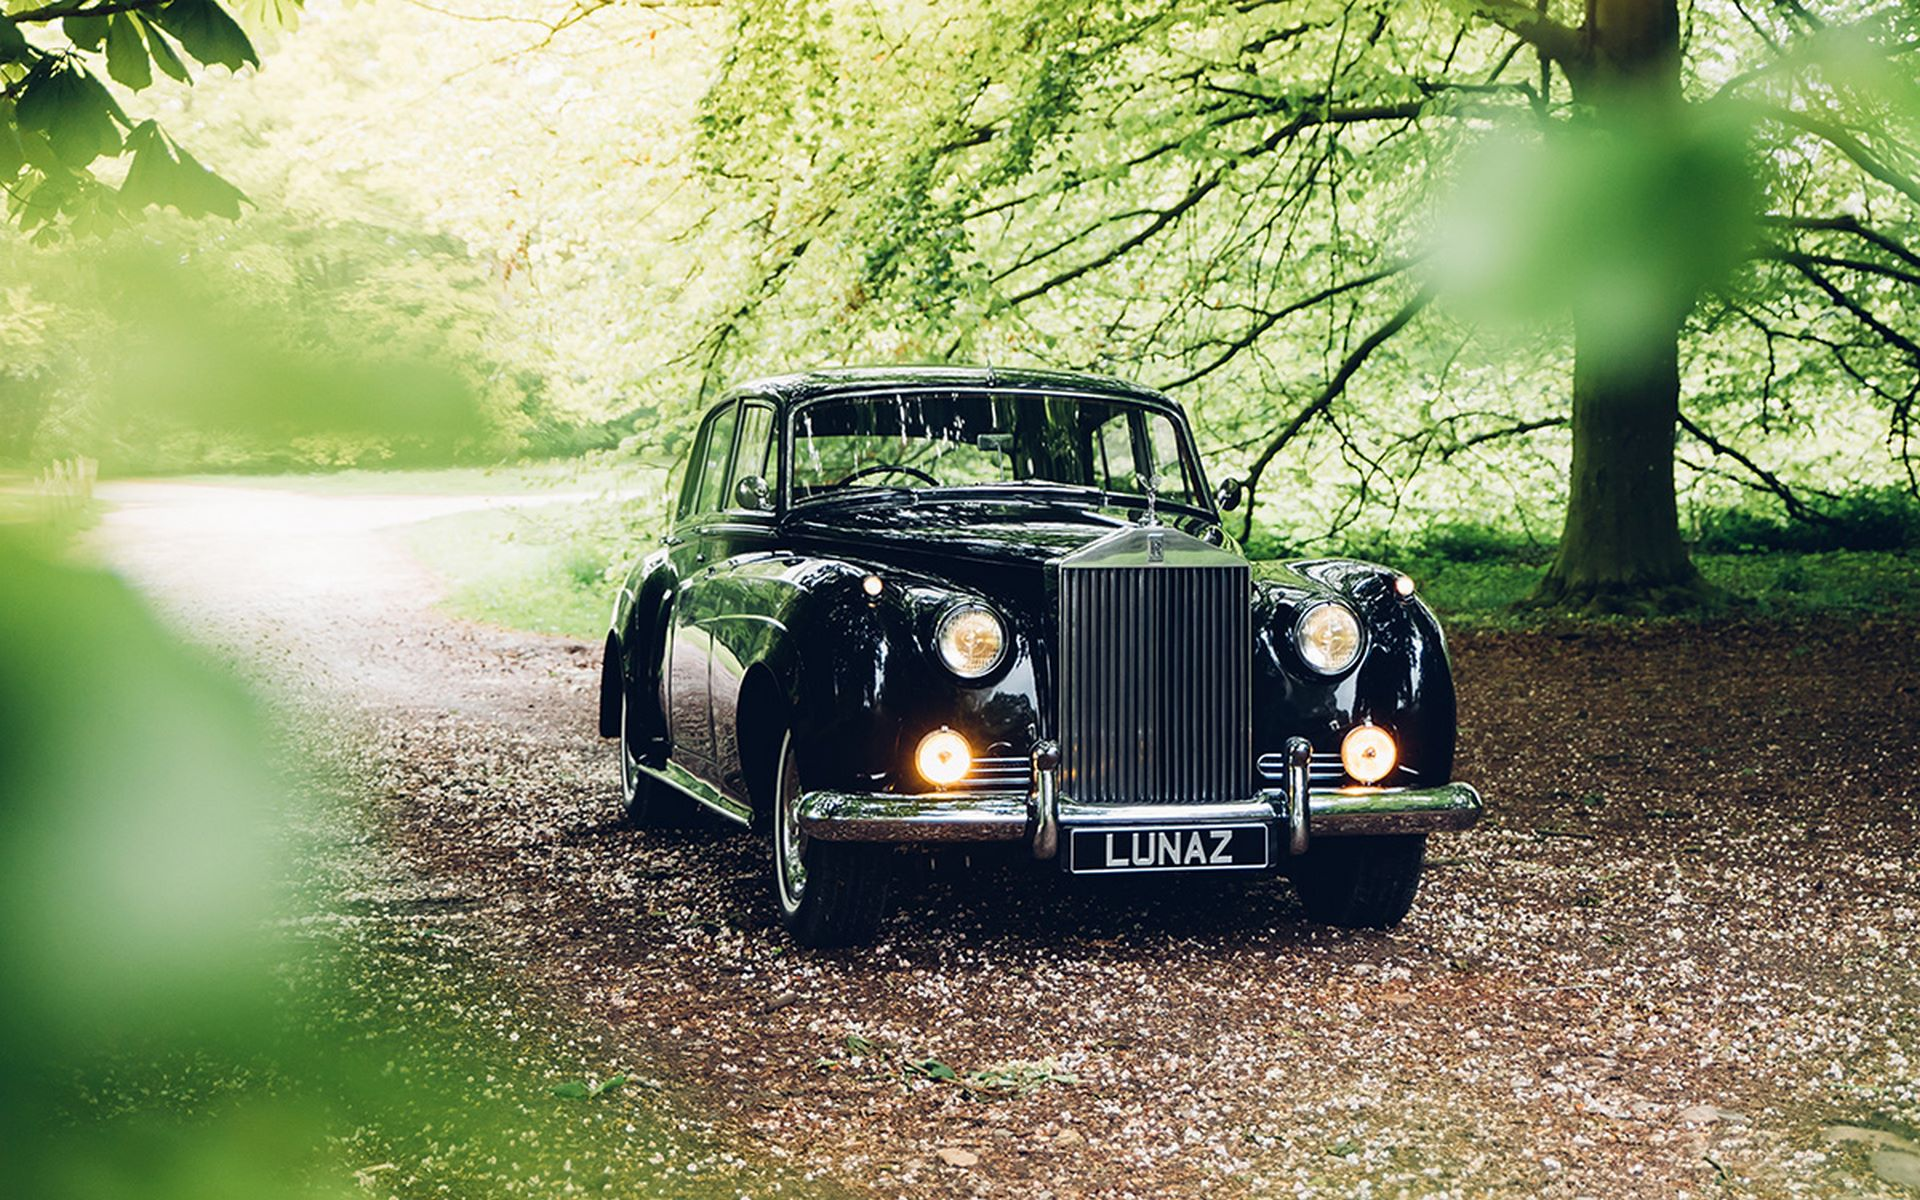 Electris-Rolls-Royce-Phantom-V-and-Silver-Cloud-by-Lunaz-10